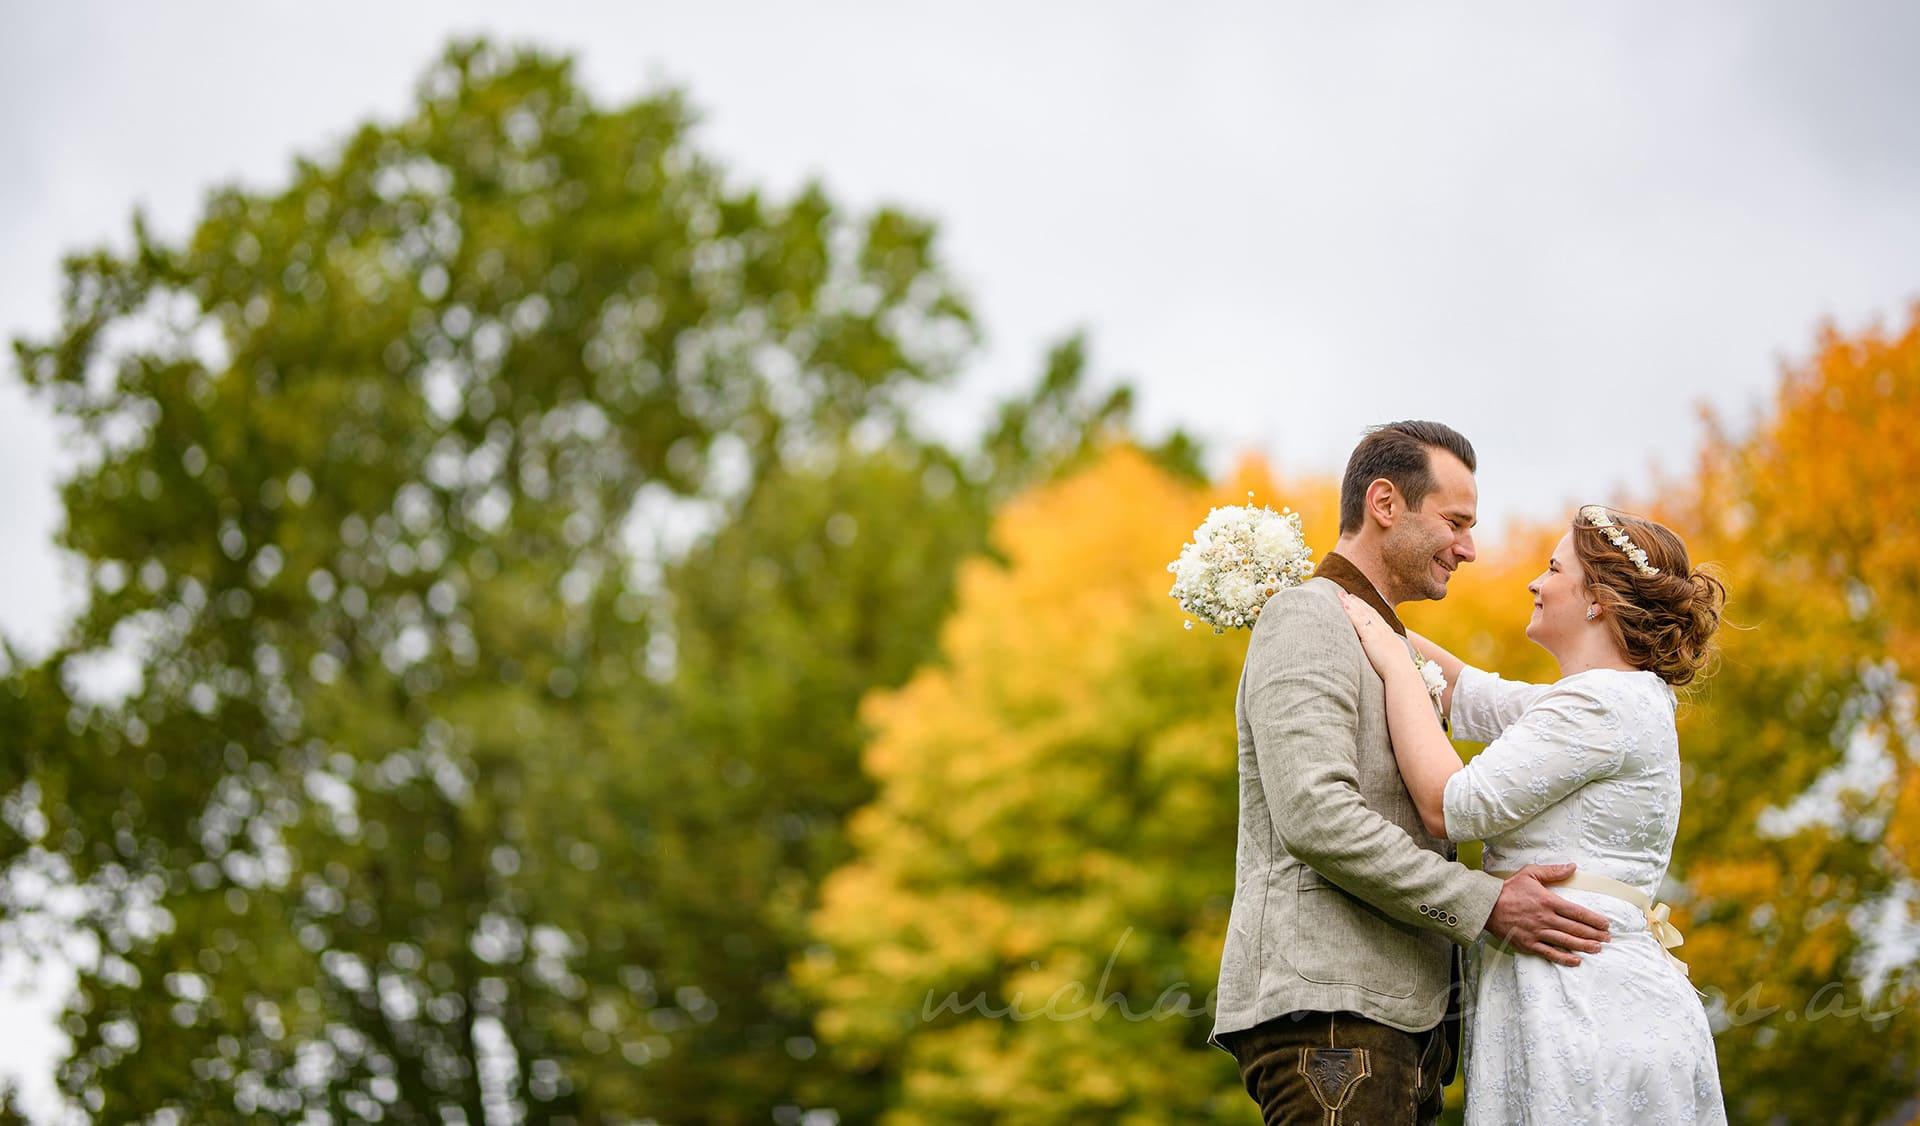 Hochzeitsfotograf Linz Wels Rohrbach Steyr Sarleinsbach